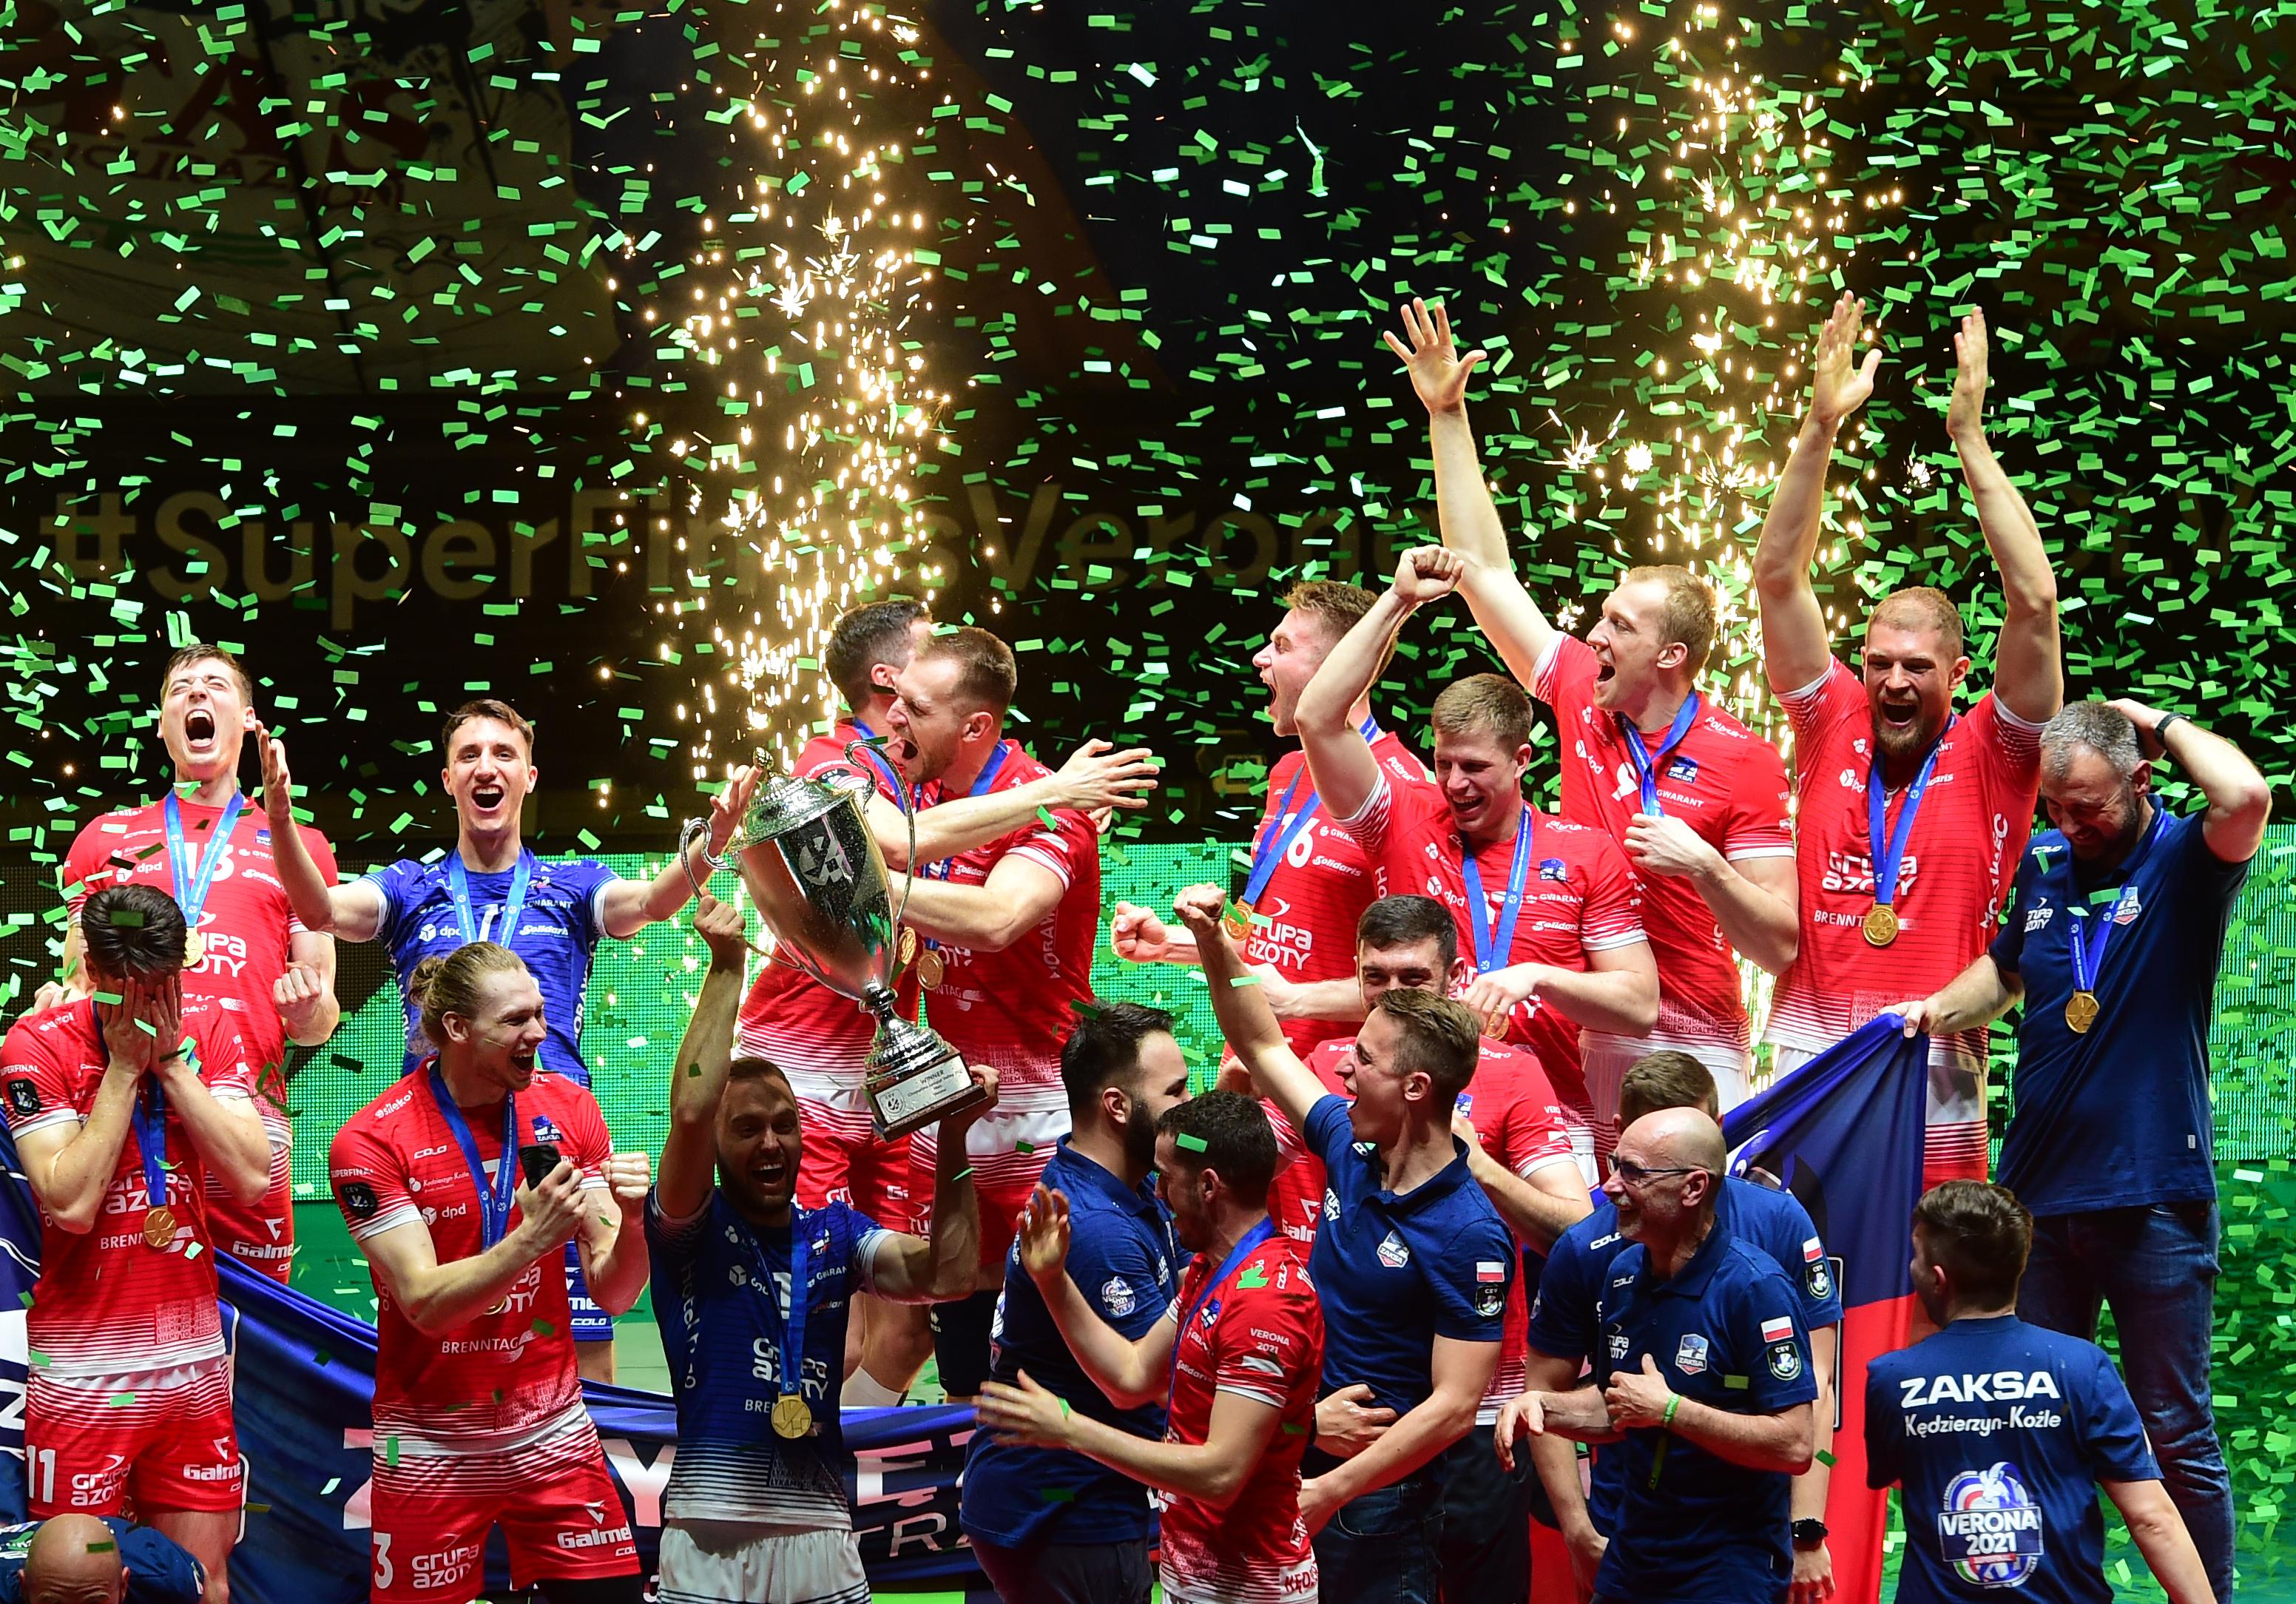 Trentino Itas v Grupa Azoty ZAKSA Kędzierzyn-Koźle - CEV Champions League Super Finals